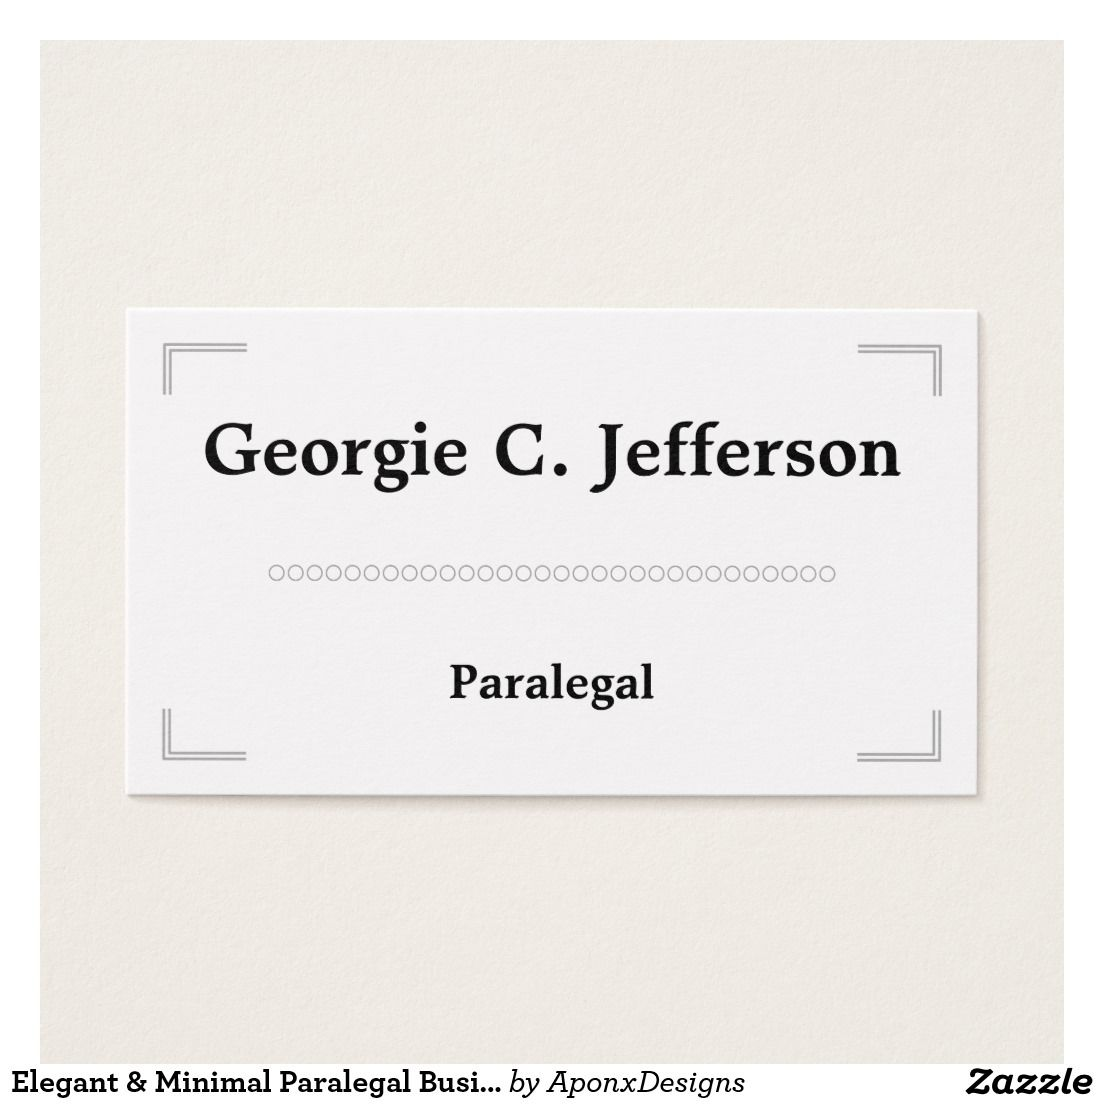 Elegant & Minimal Paralegal Business Card   Customizable Business ...